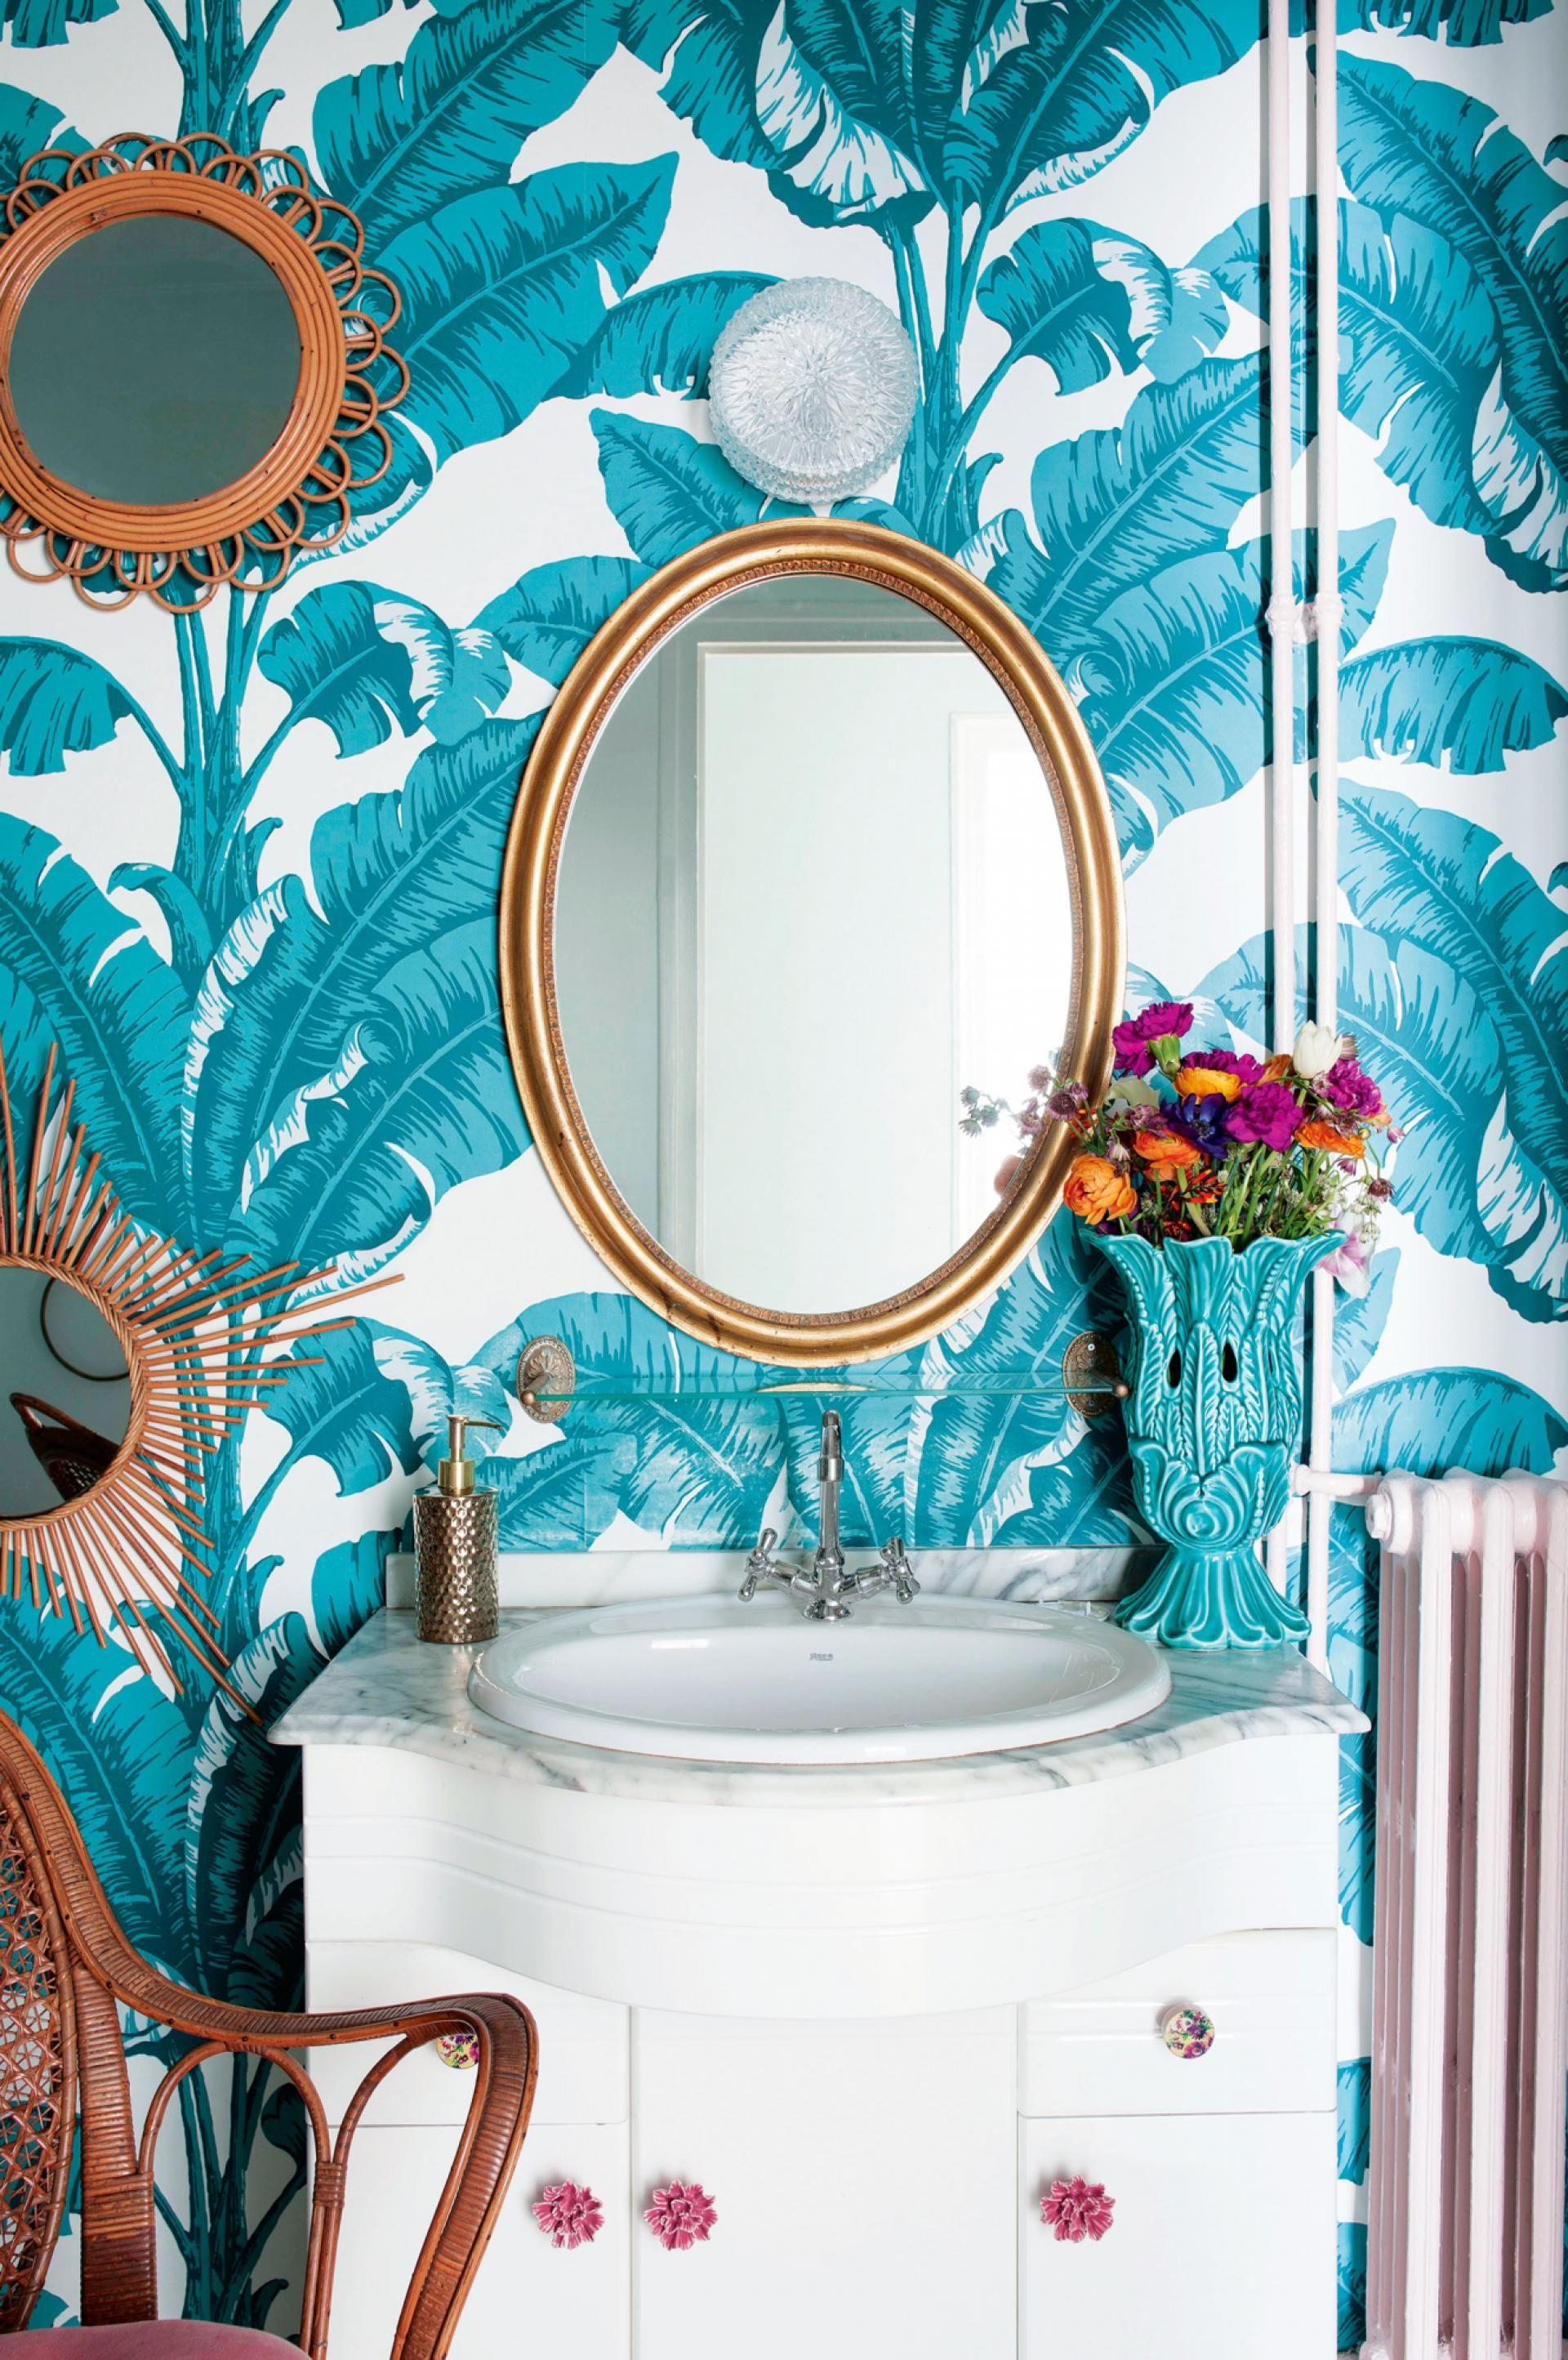 blue palm wallpaper bathroom in 2020 Bathroom wallpaper